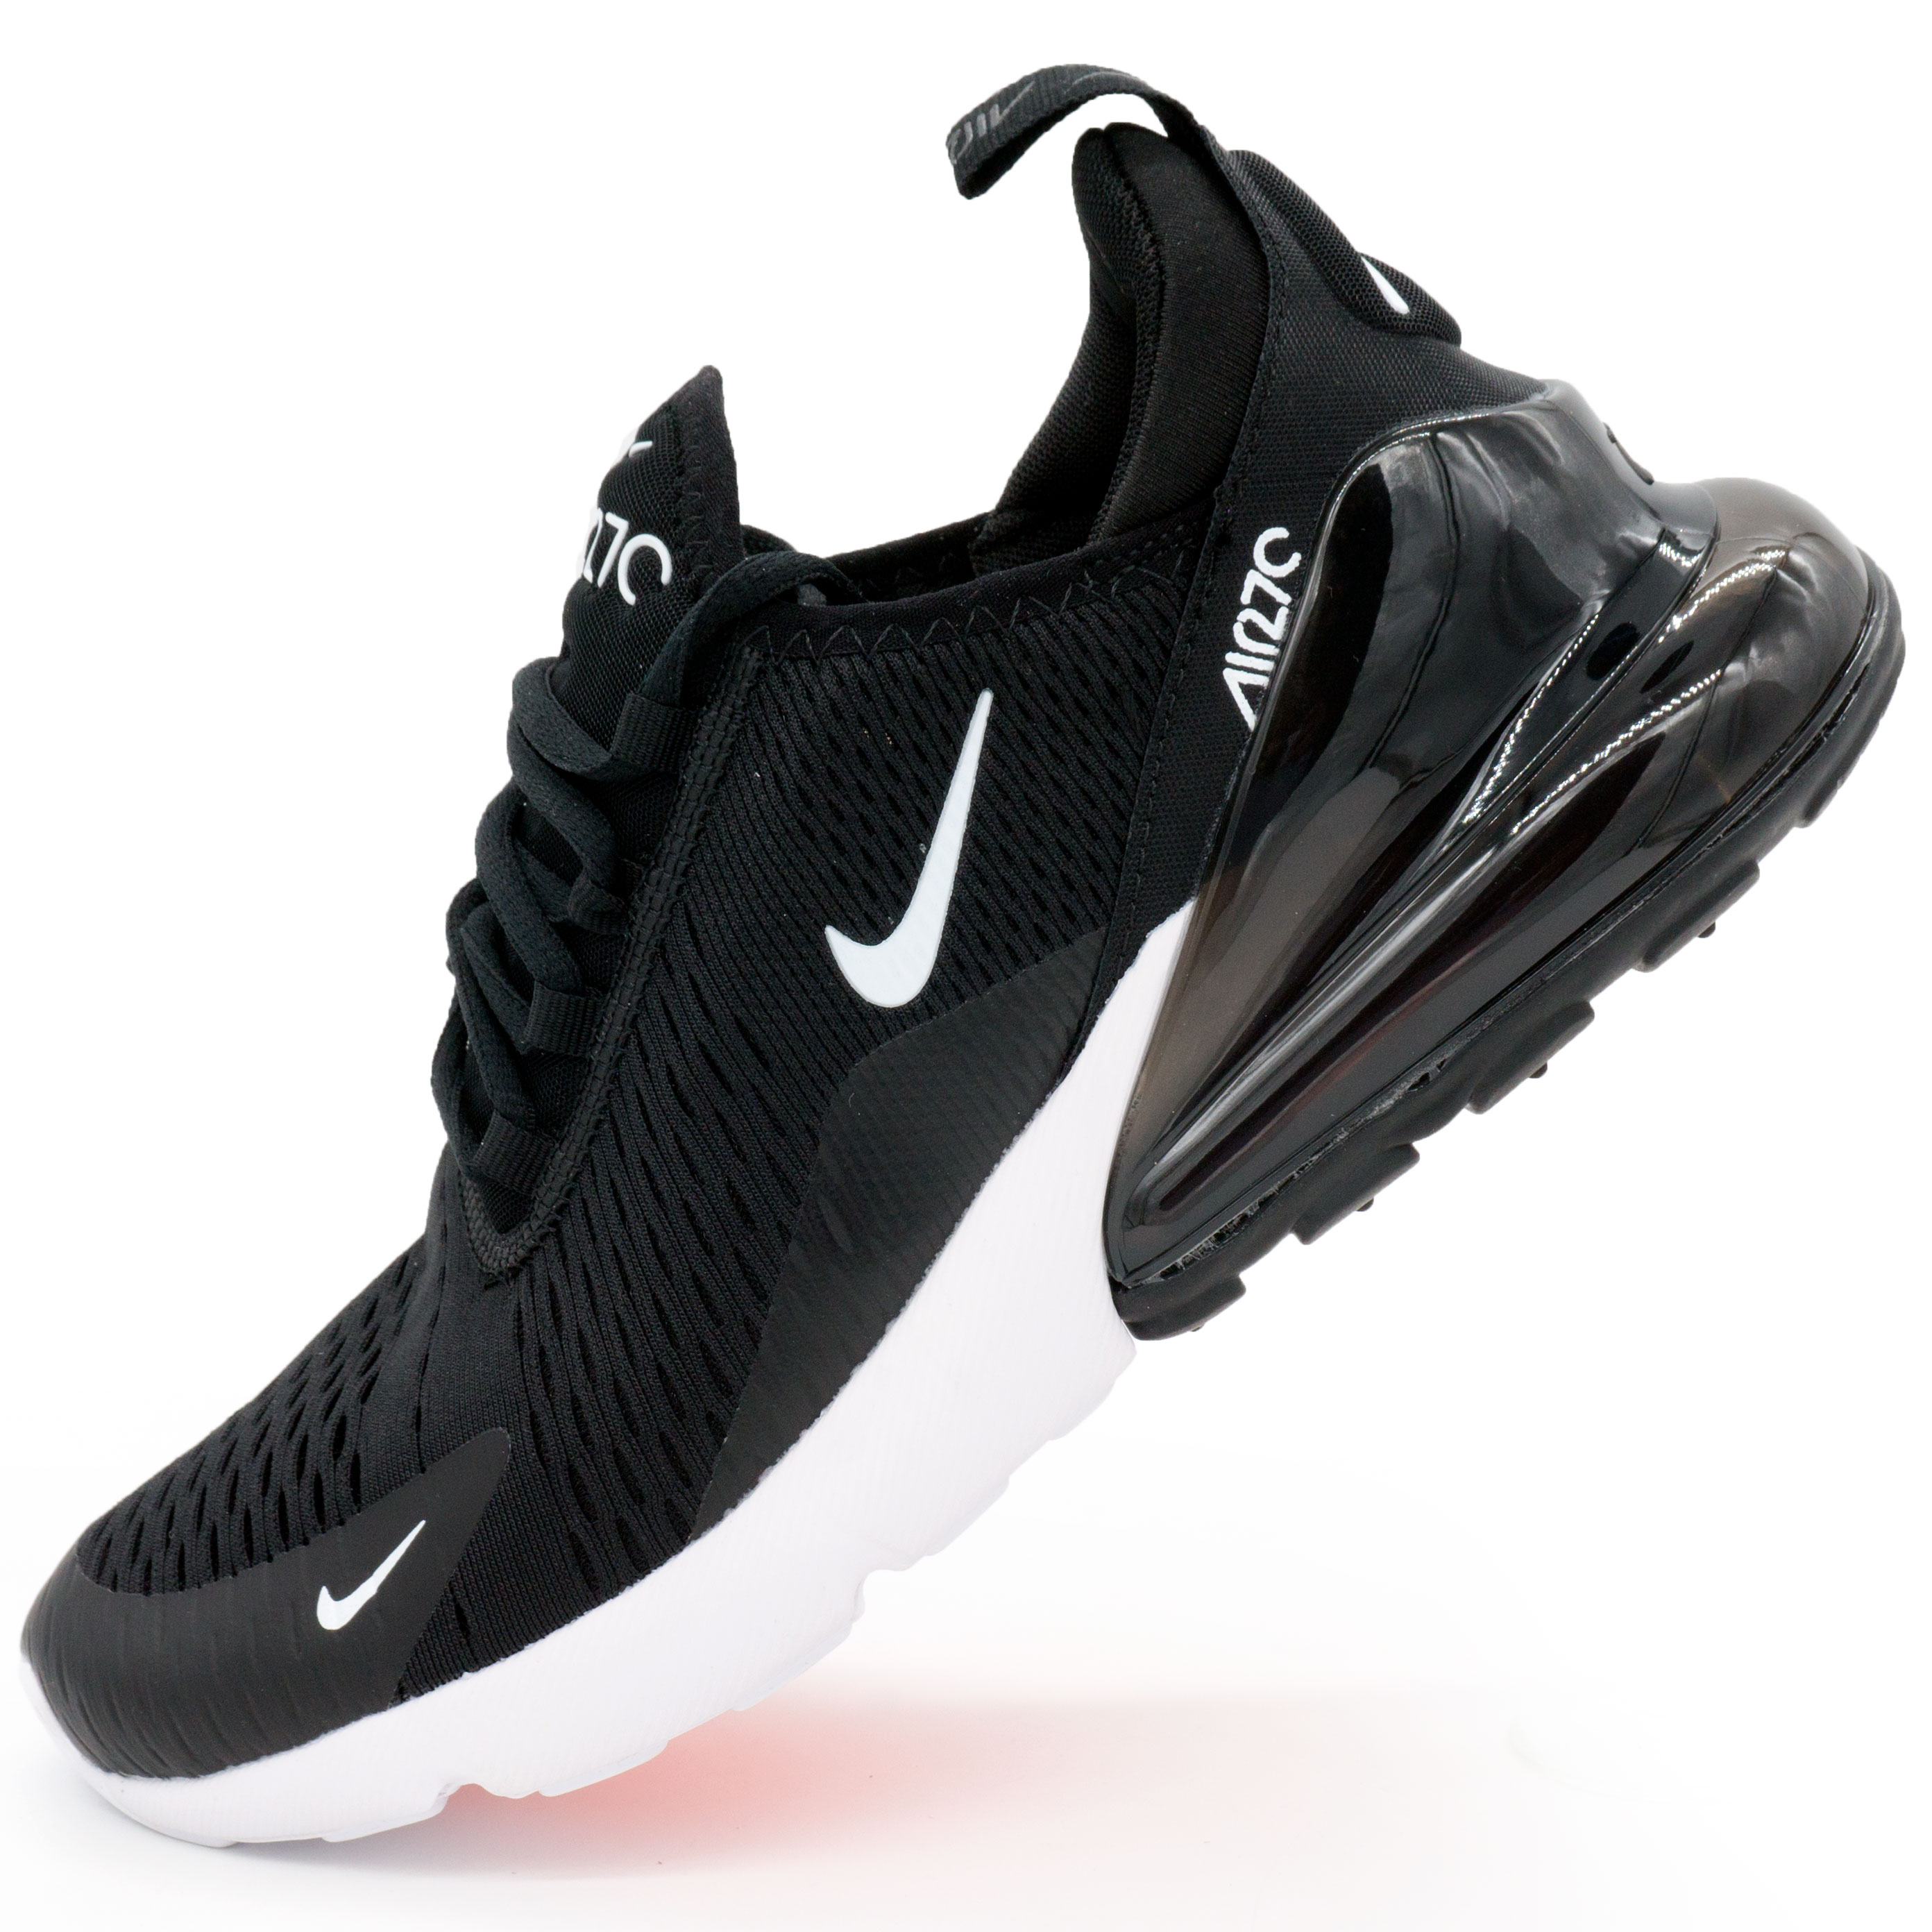 0bb3cbc1 Топ качество! фото main Кроссовки Nike Air Max 270 Flyknit черно белые.